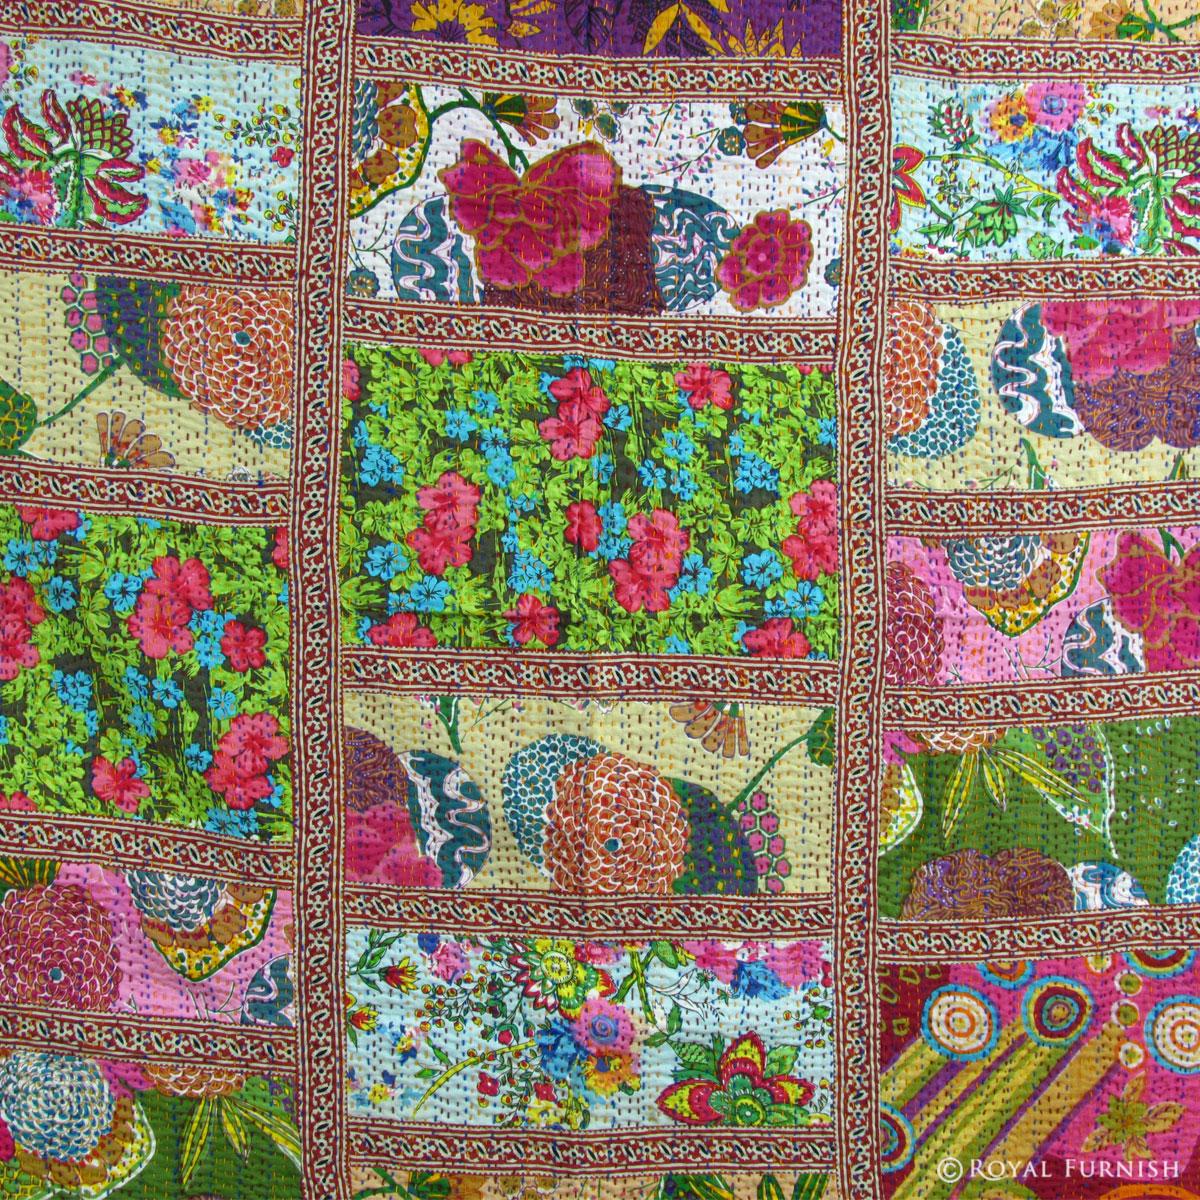 Queen Size Multicolor Patchwork Kantha Quilt Blanket